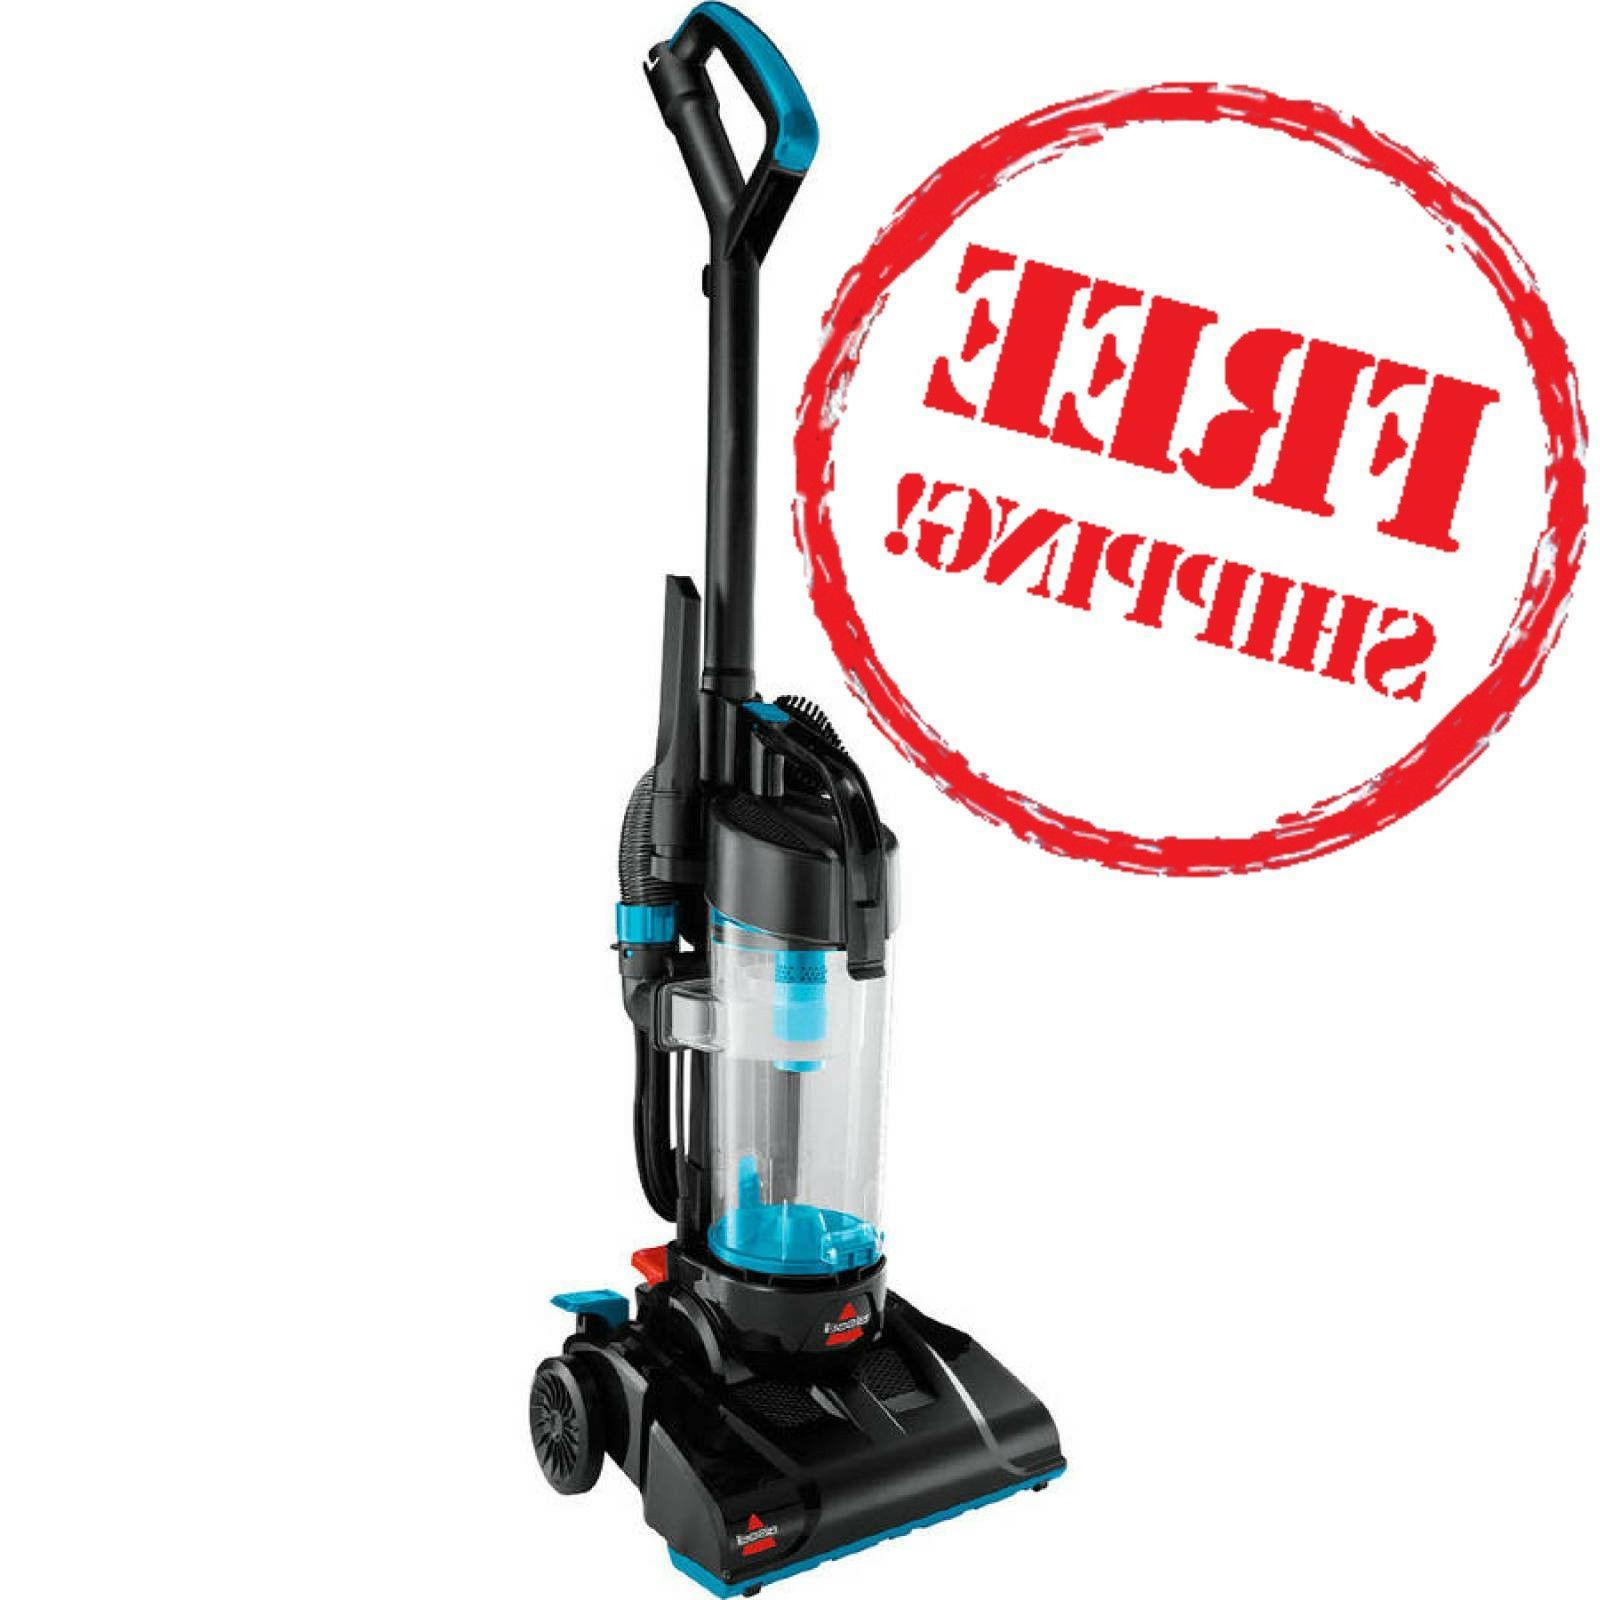 powerforce compact bagless vacuum